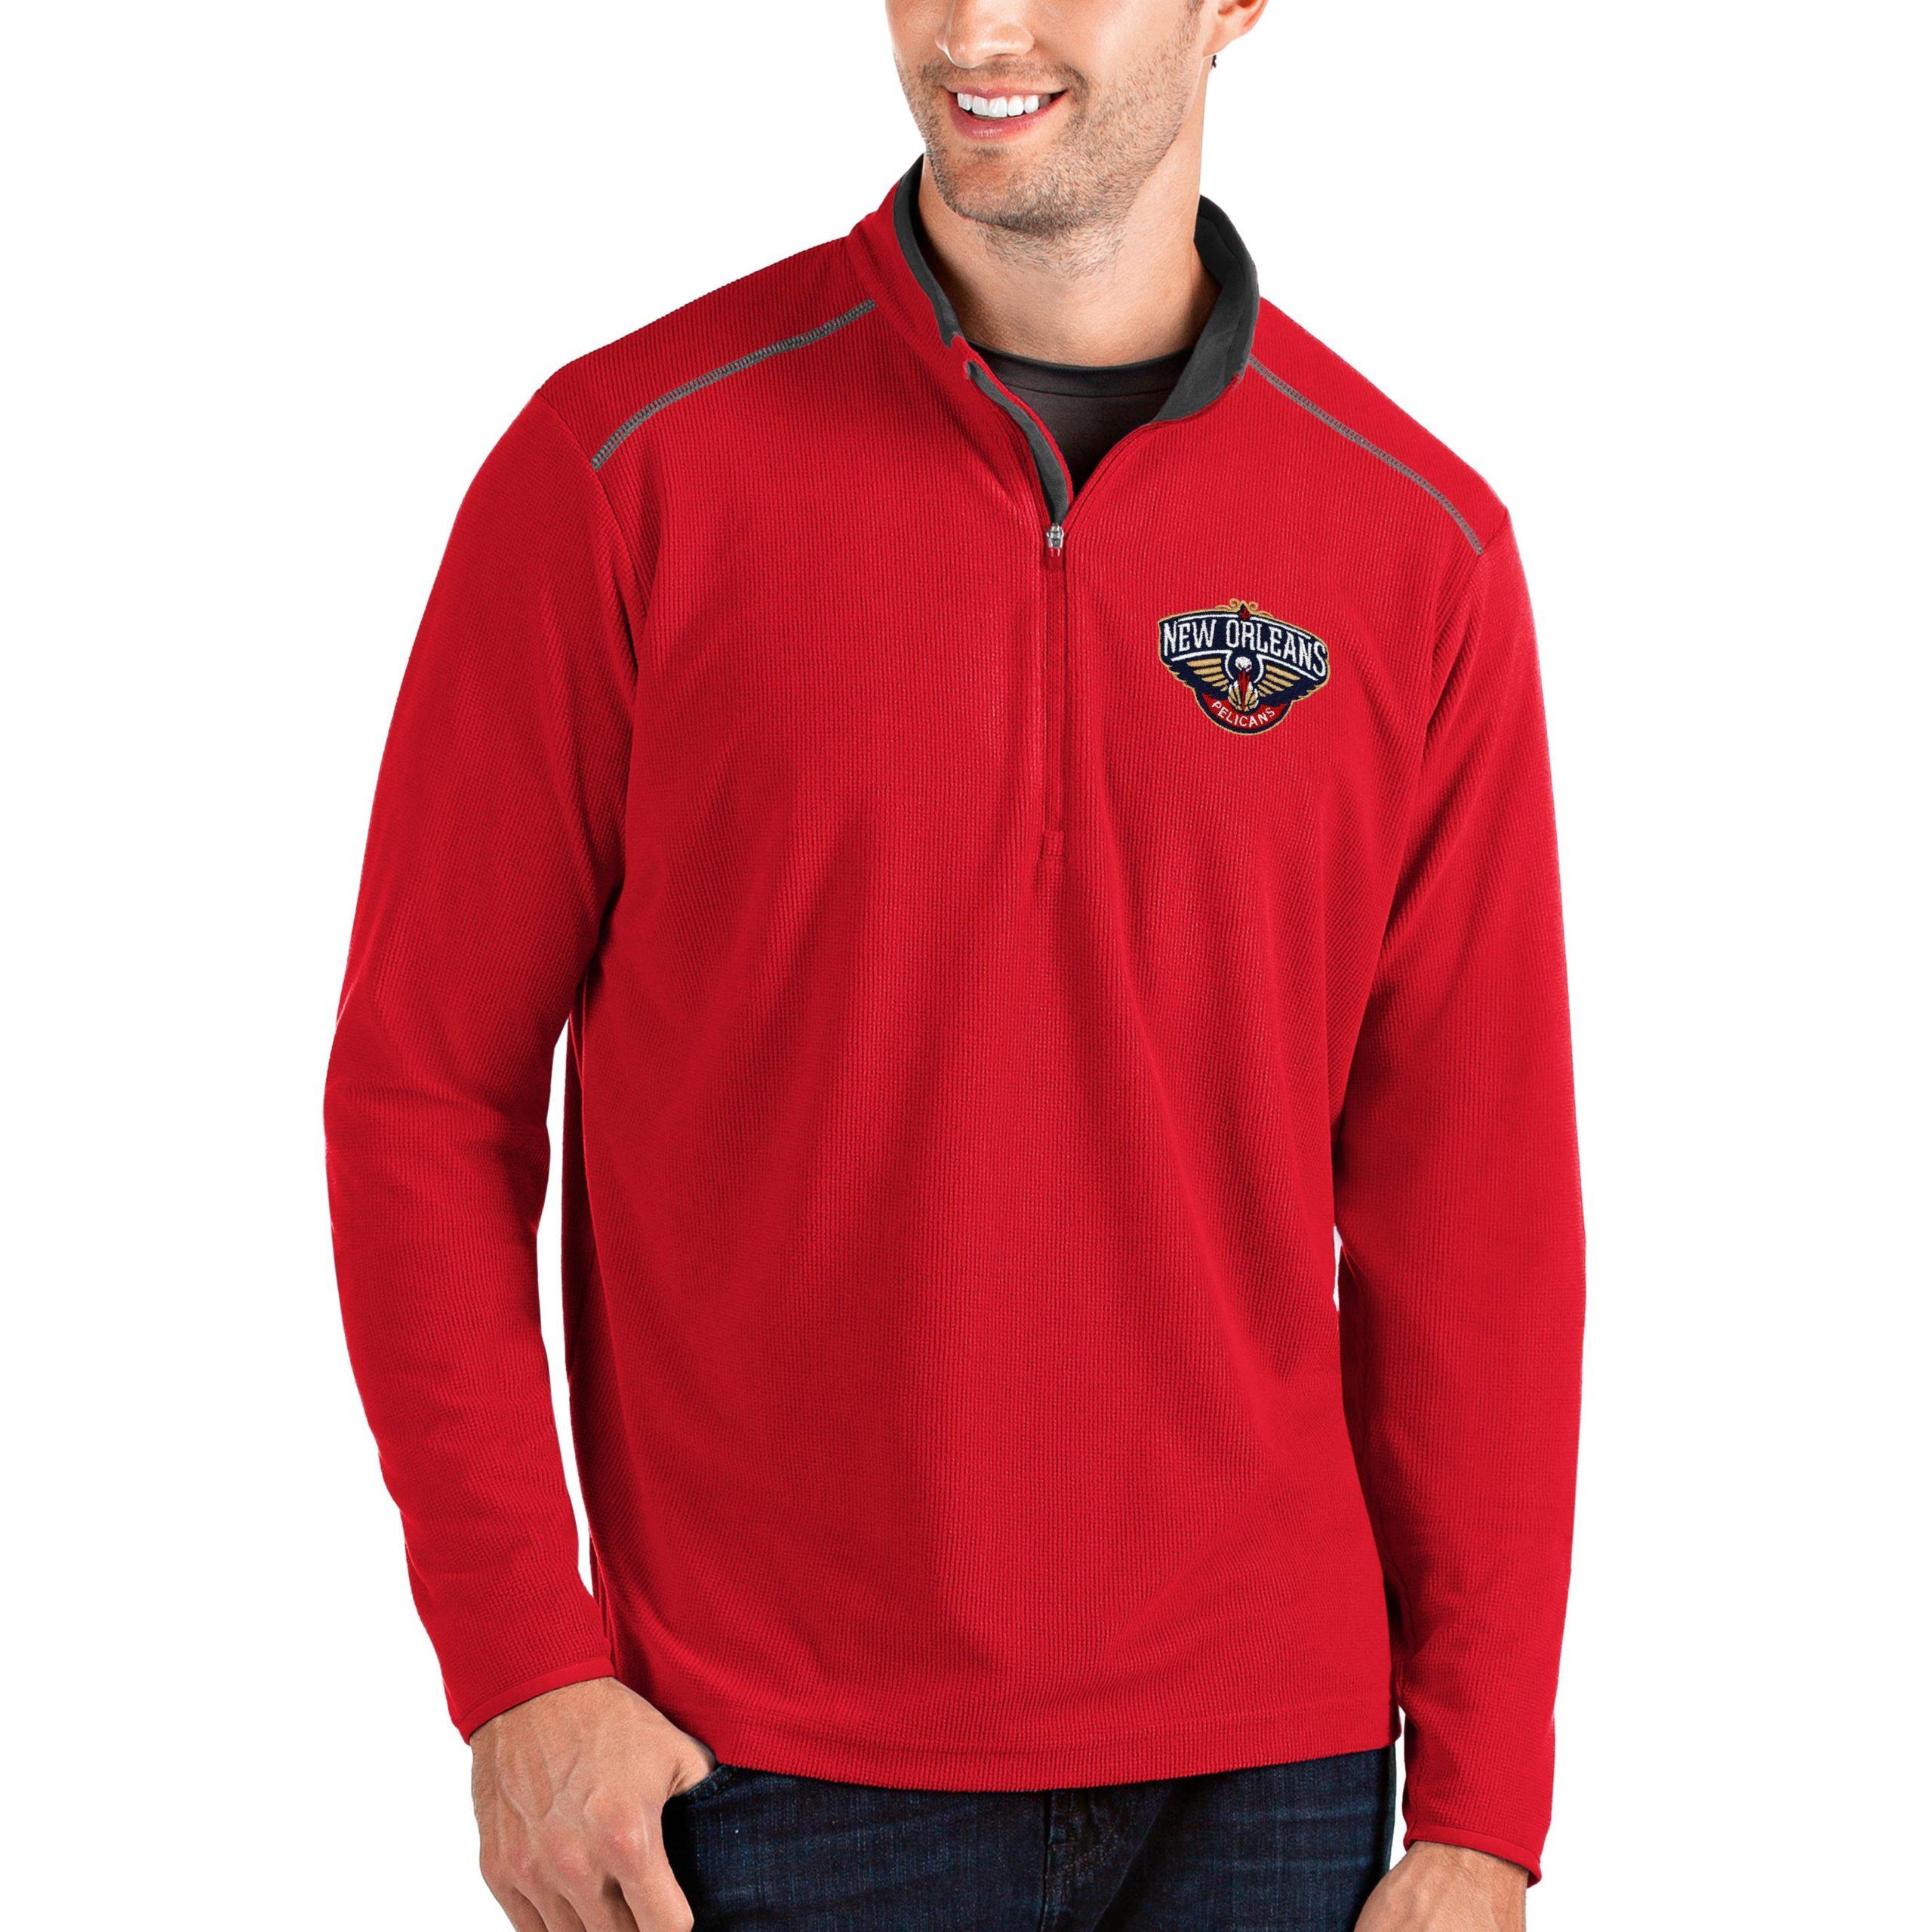 New Orleans Pelicans Antigua Big & Tall Glacier Quarter-Zip Pullover Jacket - Red/Gray